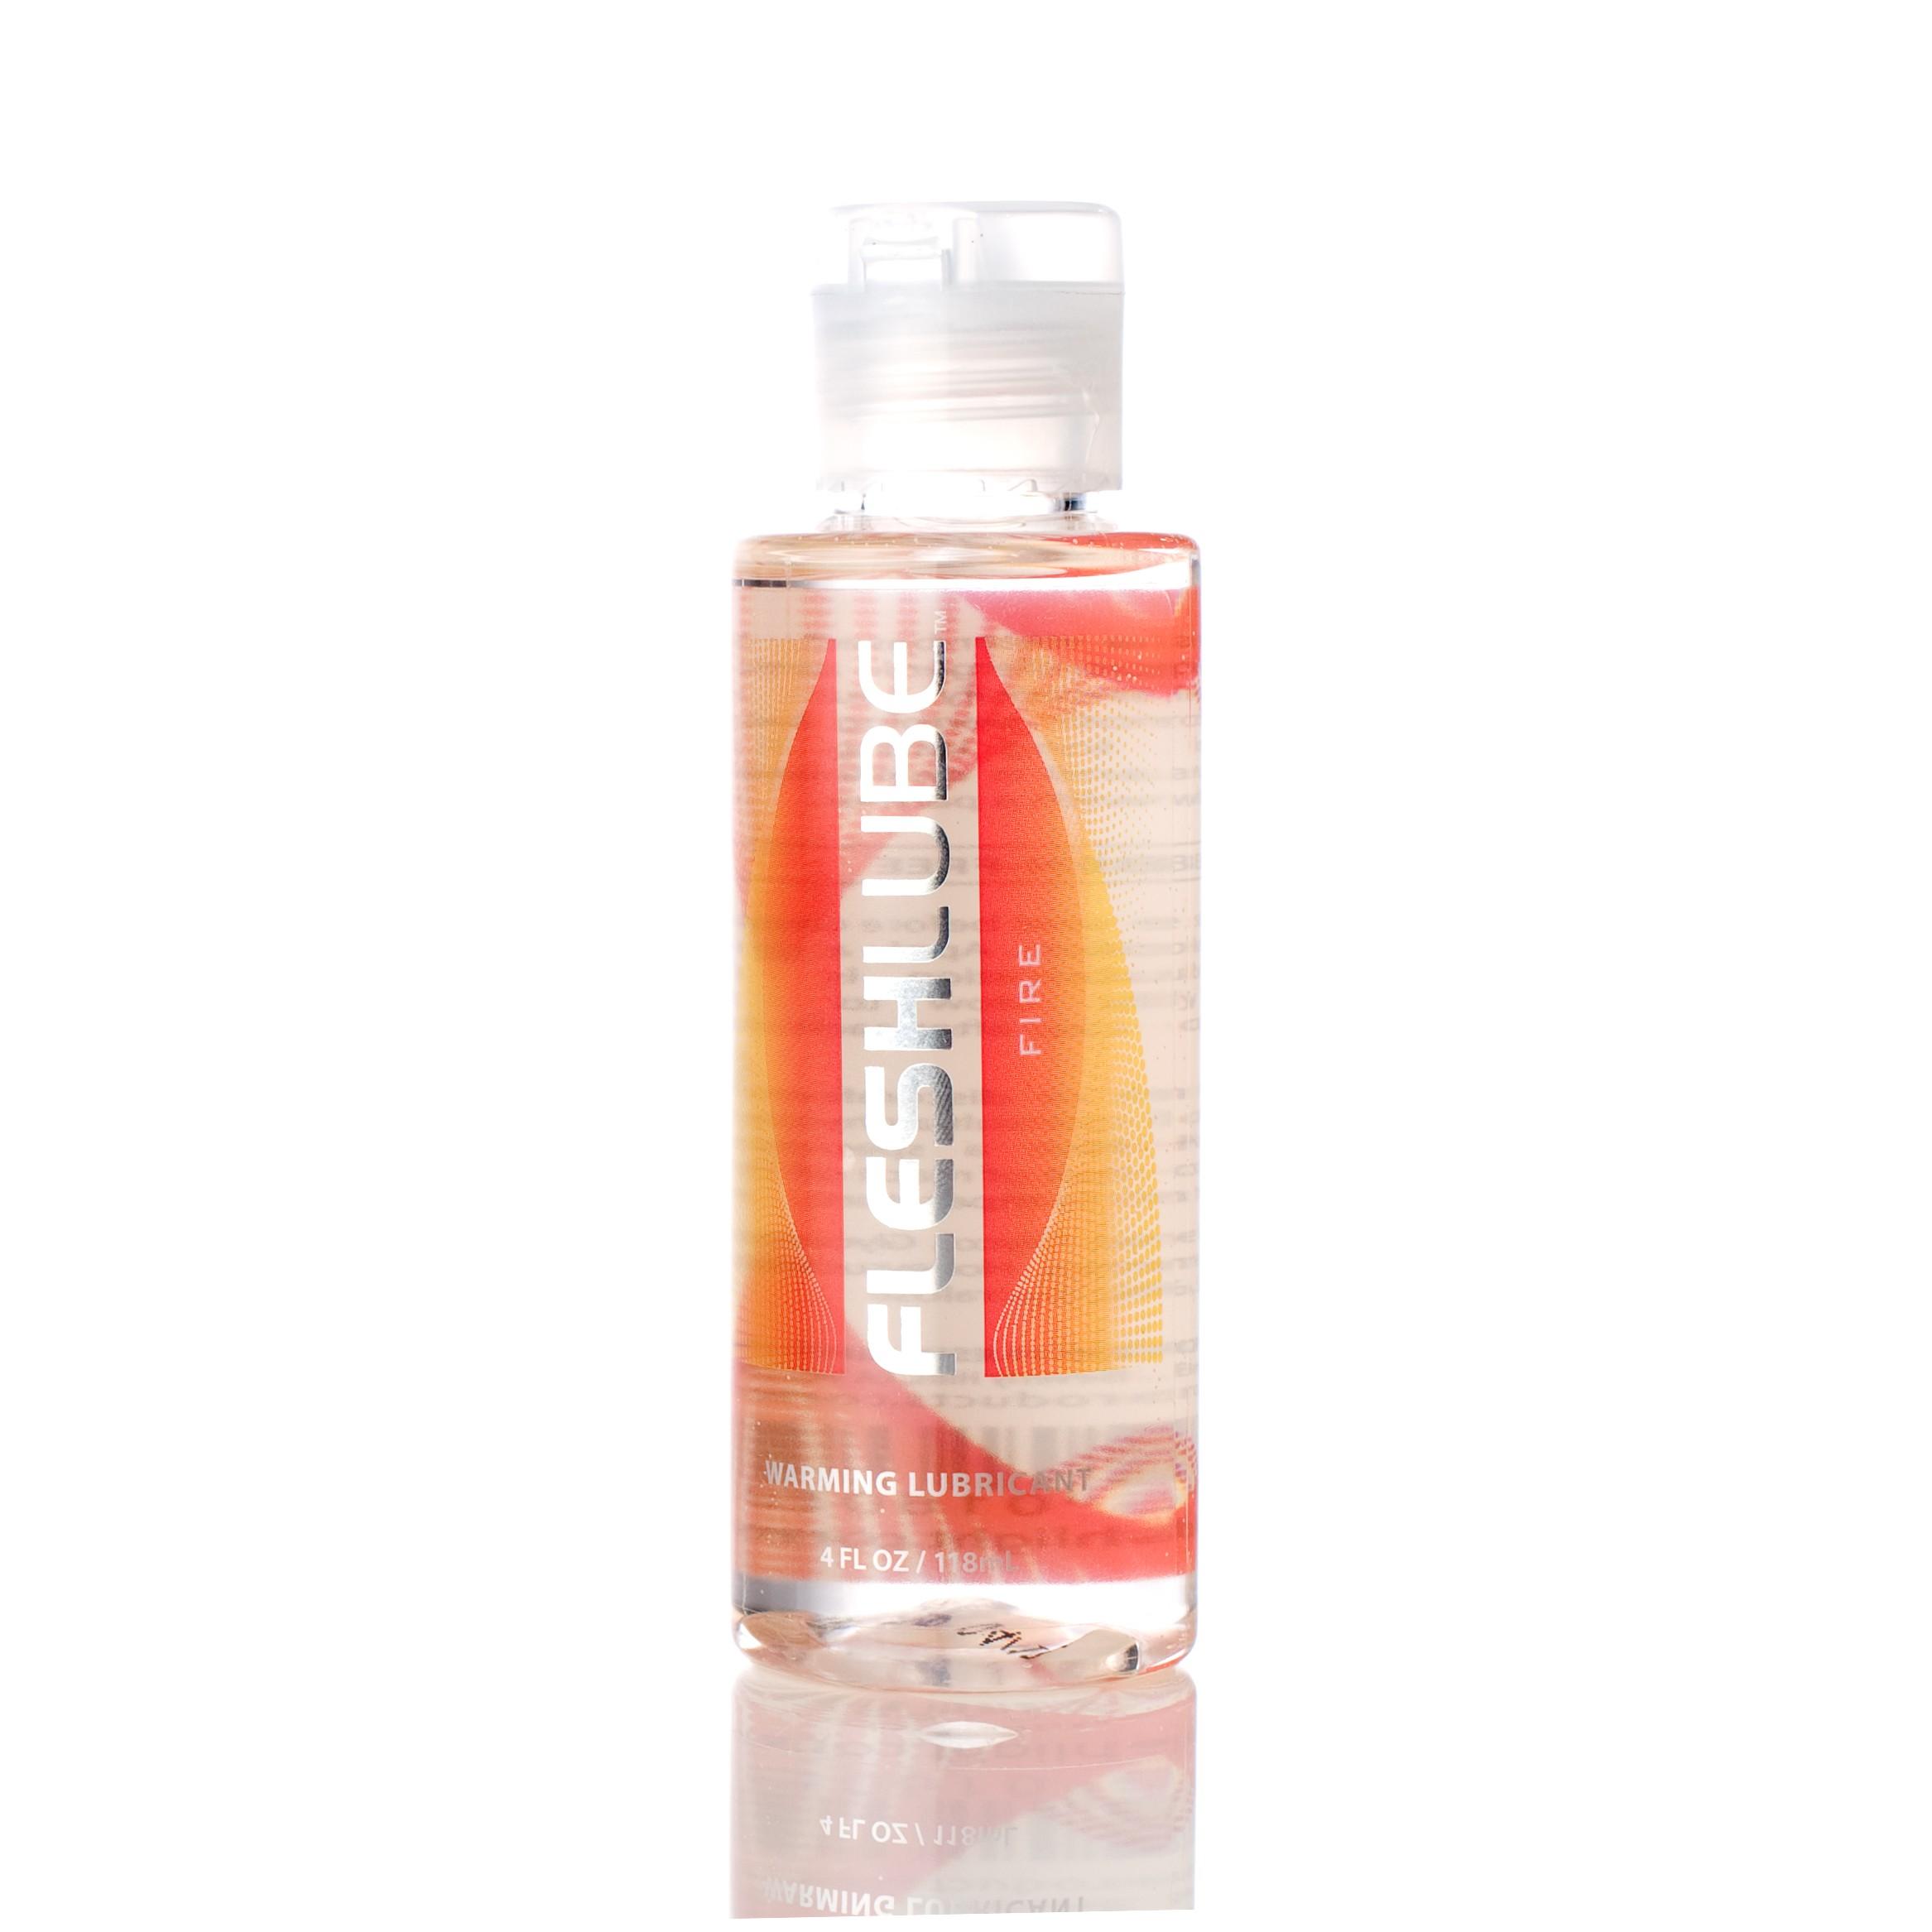 Fleshlube Fire Warming Water Based Lubricant 4oz